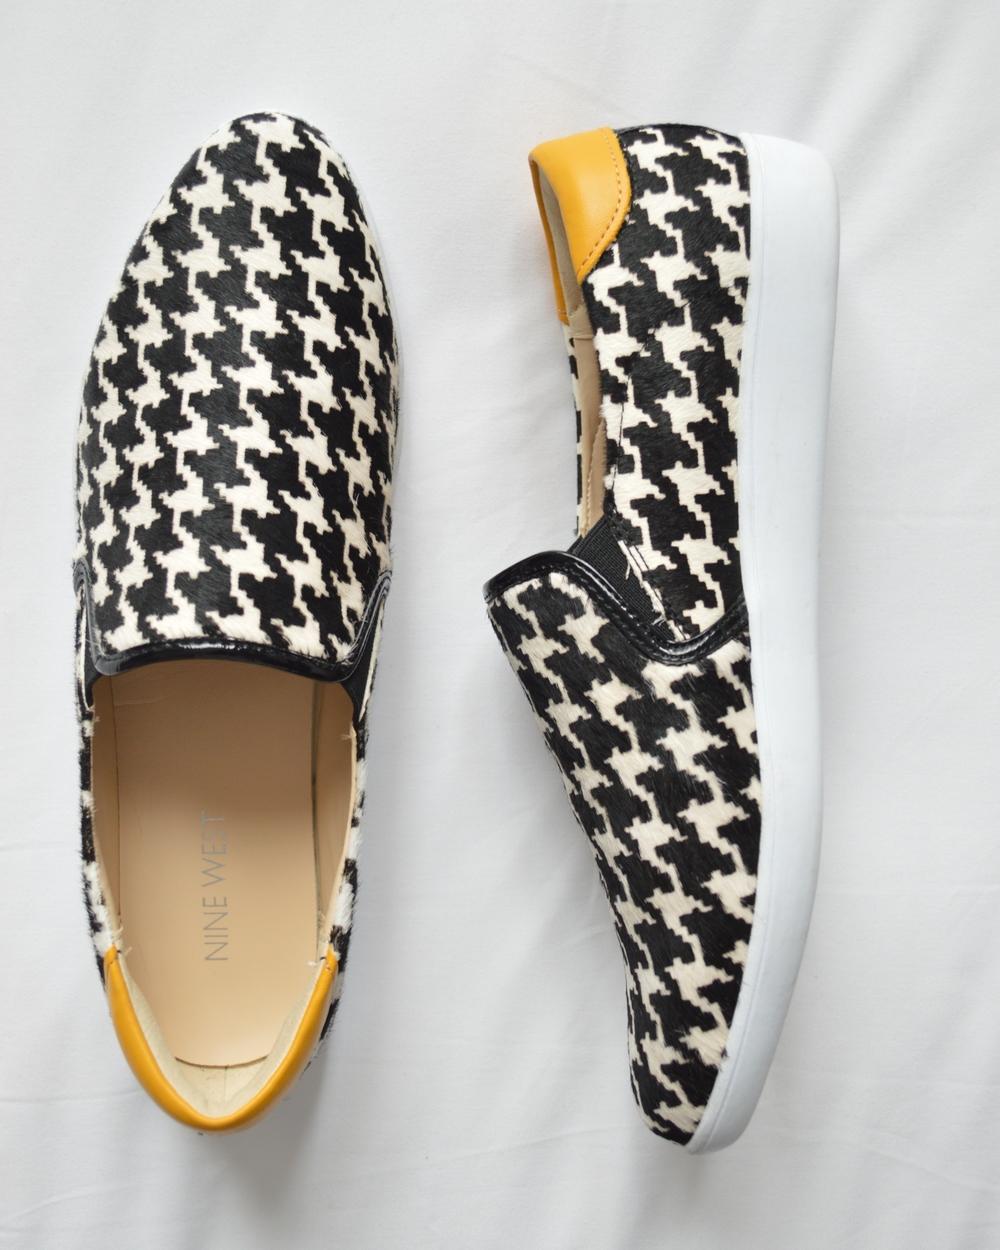 LaurenSchwaiger-Life-Style-Blog-NineWest-Houndstooth-Slip-On-Sneaker.jpg